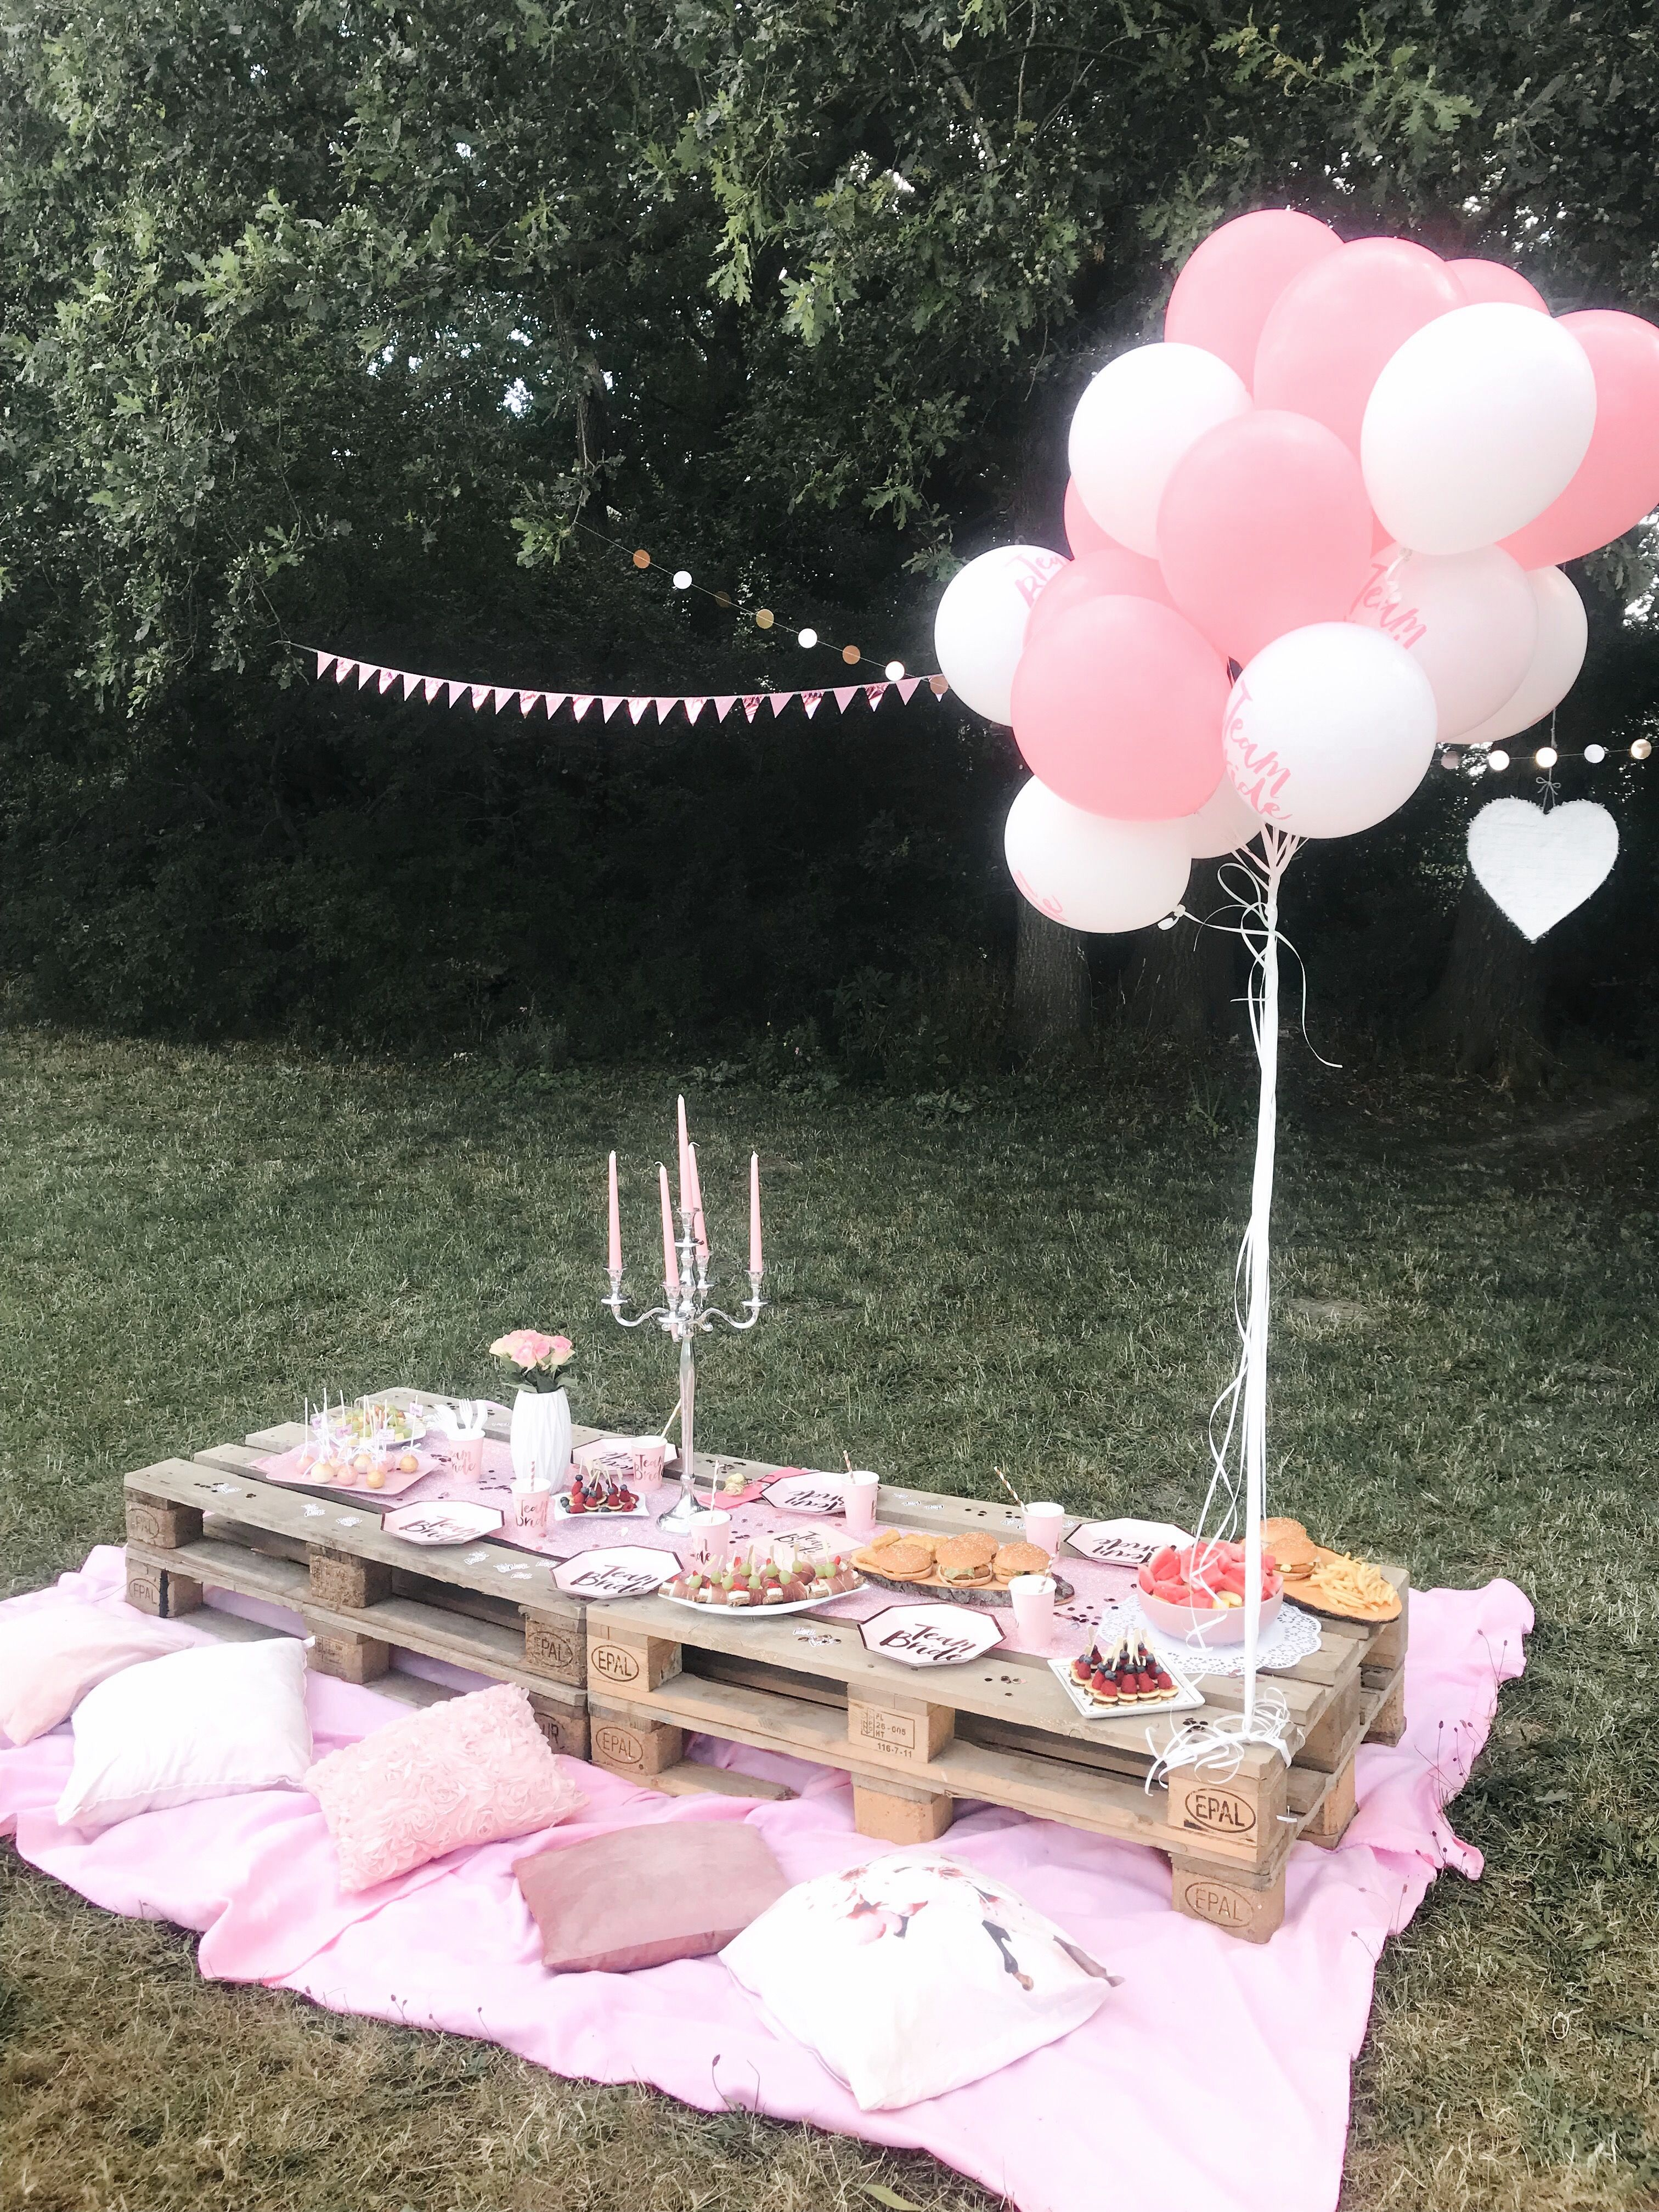 JGA - Ideen  Picnic birthday party, Picnic birthday, Birthday